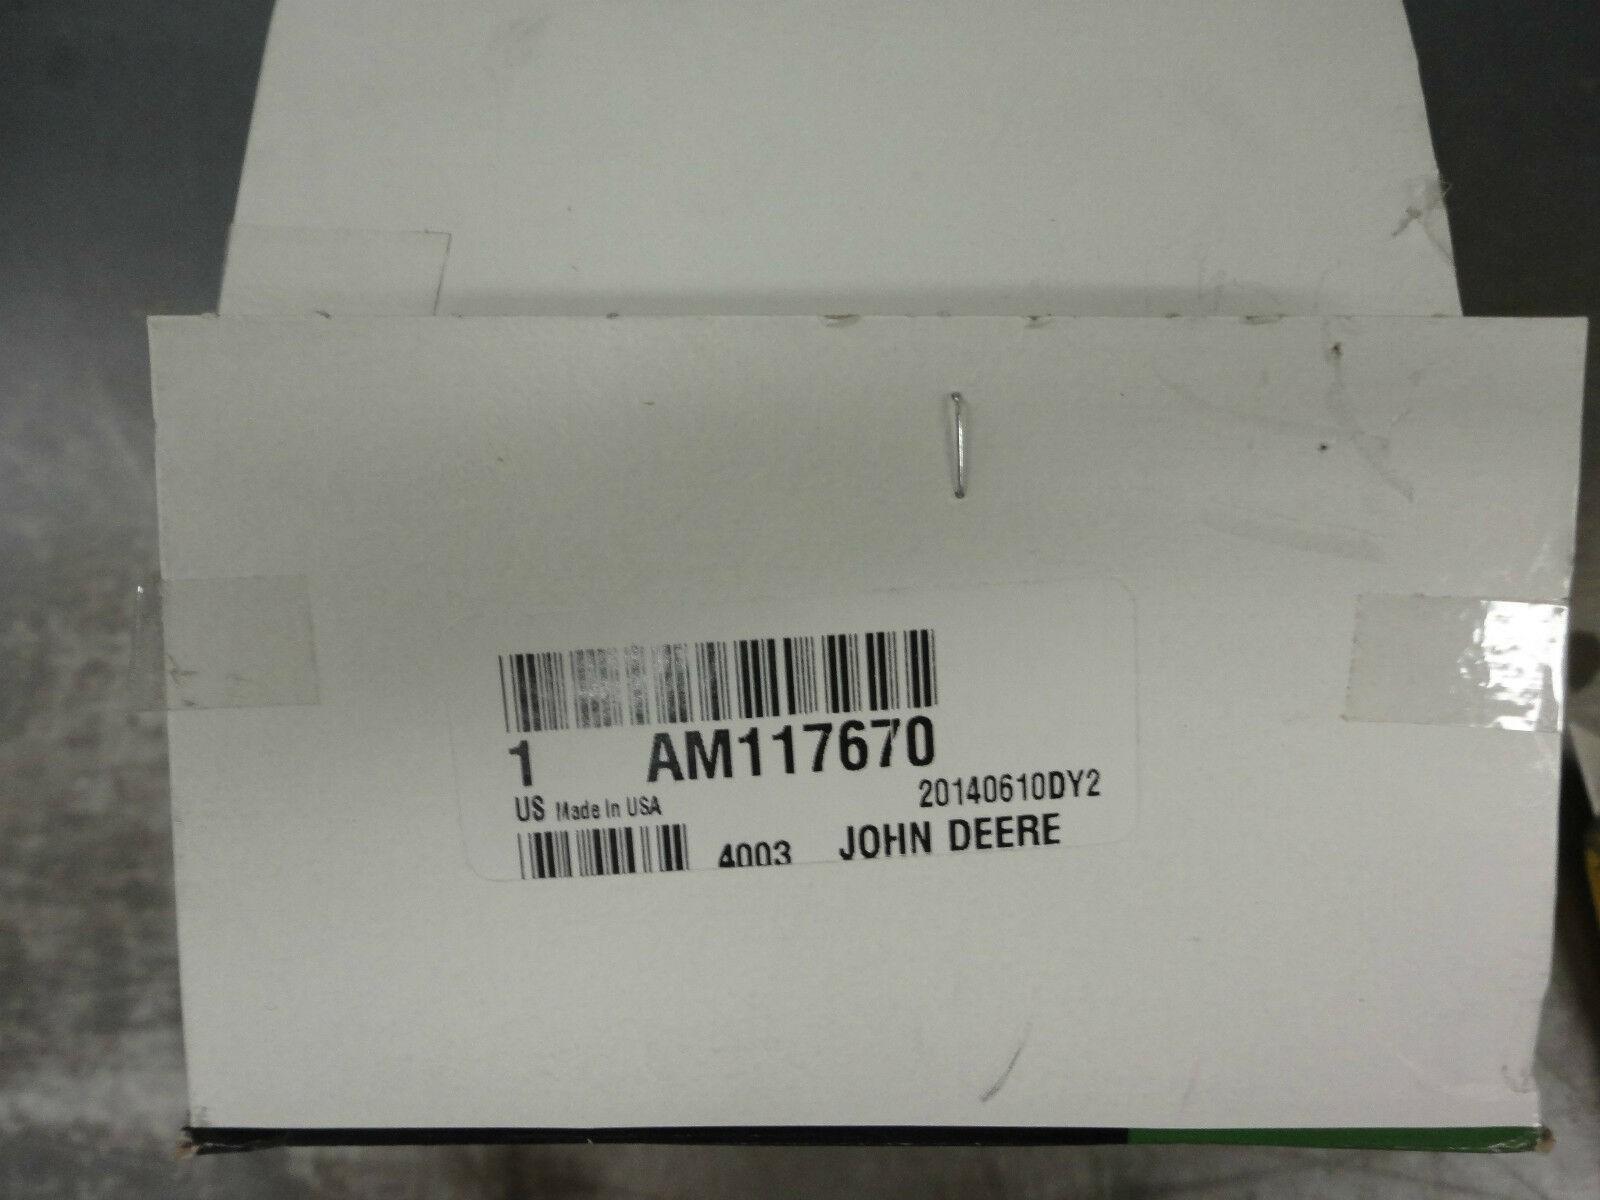 John Deere Gator Ts 4 X 2 Wire John Deere Headlight Am for Gator 4×2 6×4 M Gator Of John Deere Gator Ts 4 X 2 Wire